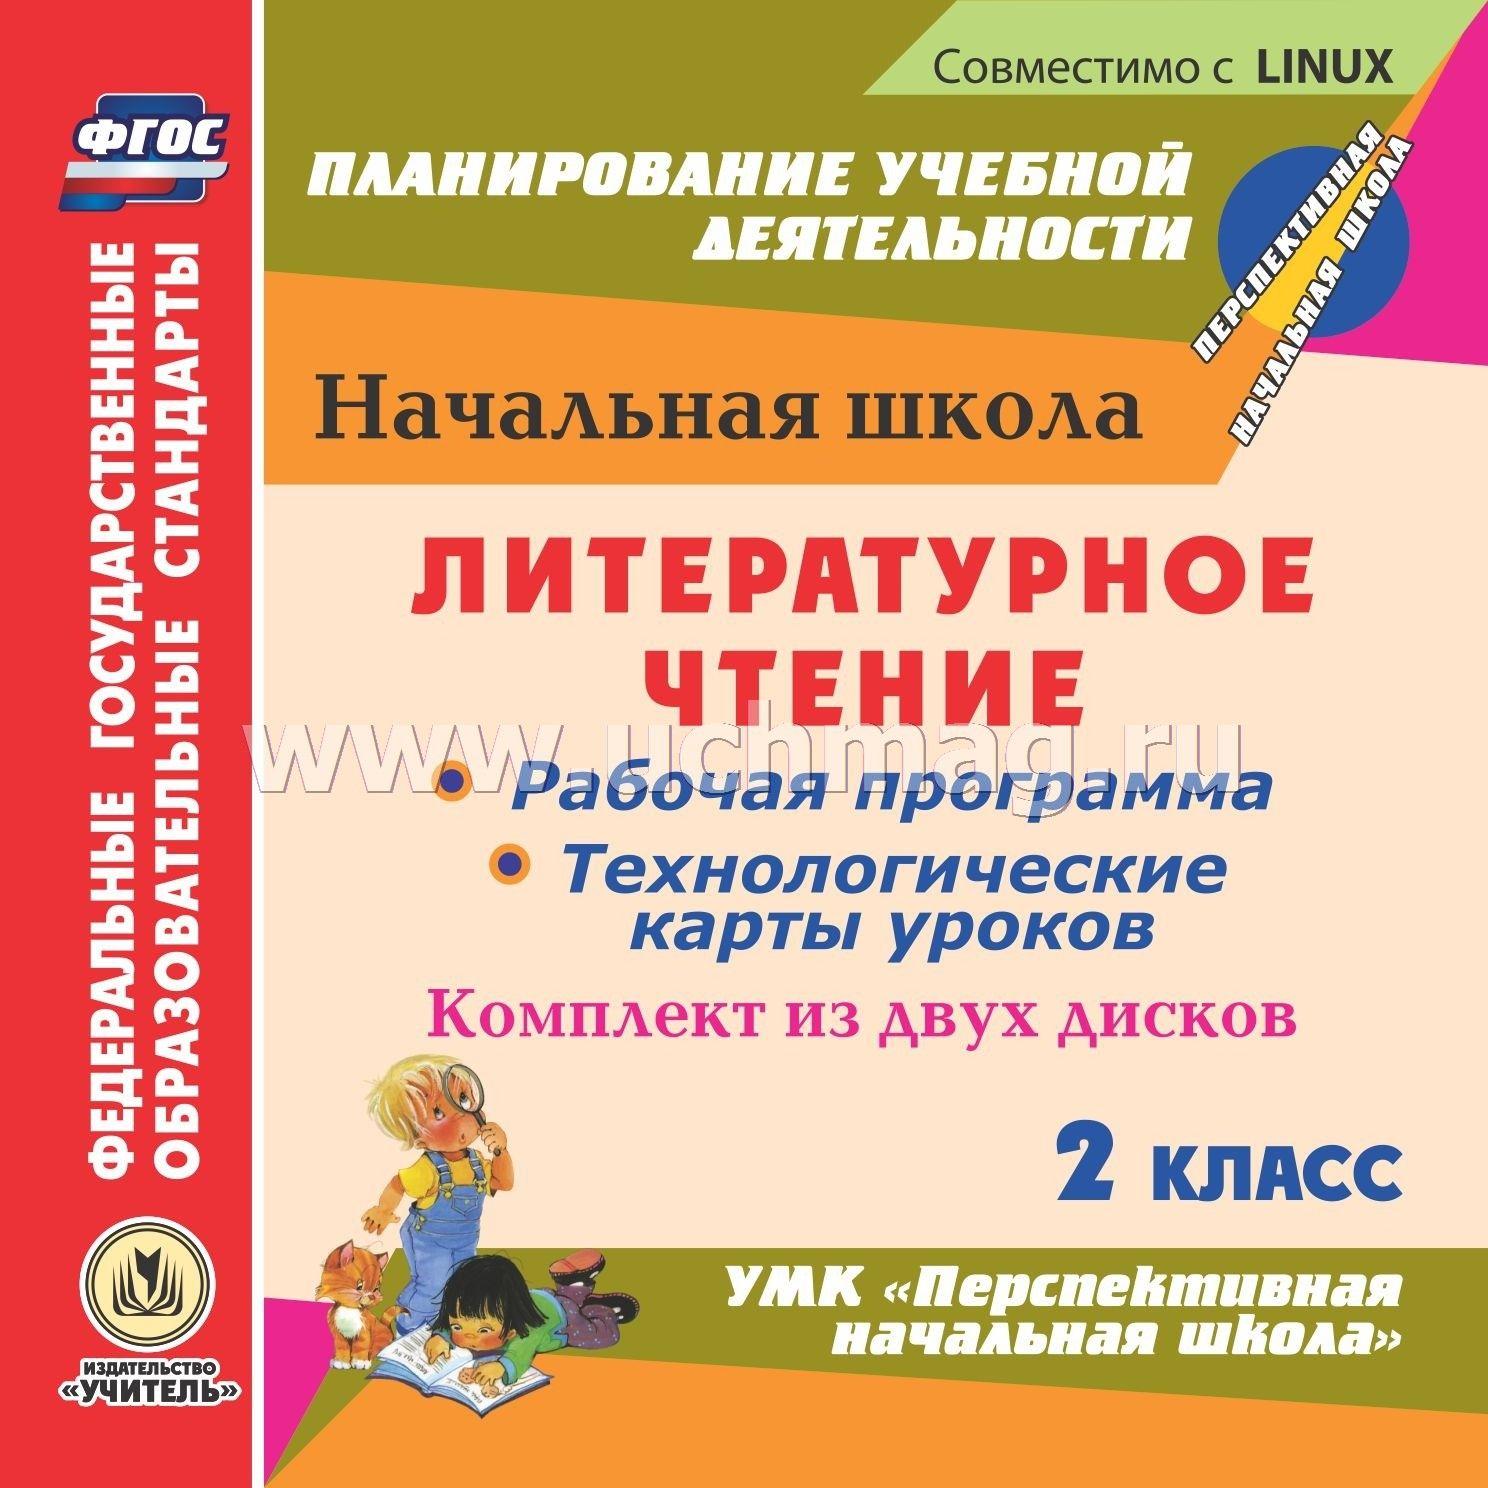 Рабочая программа 2018 год по русскому 2 класс перспективная начальная школа